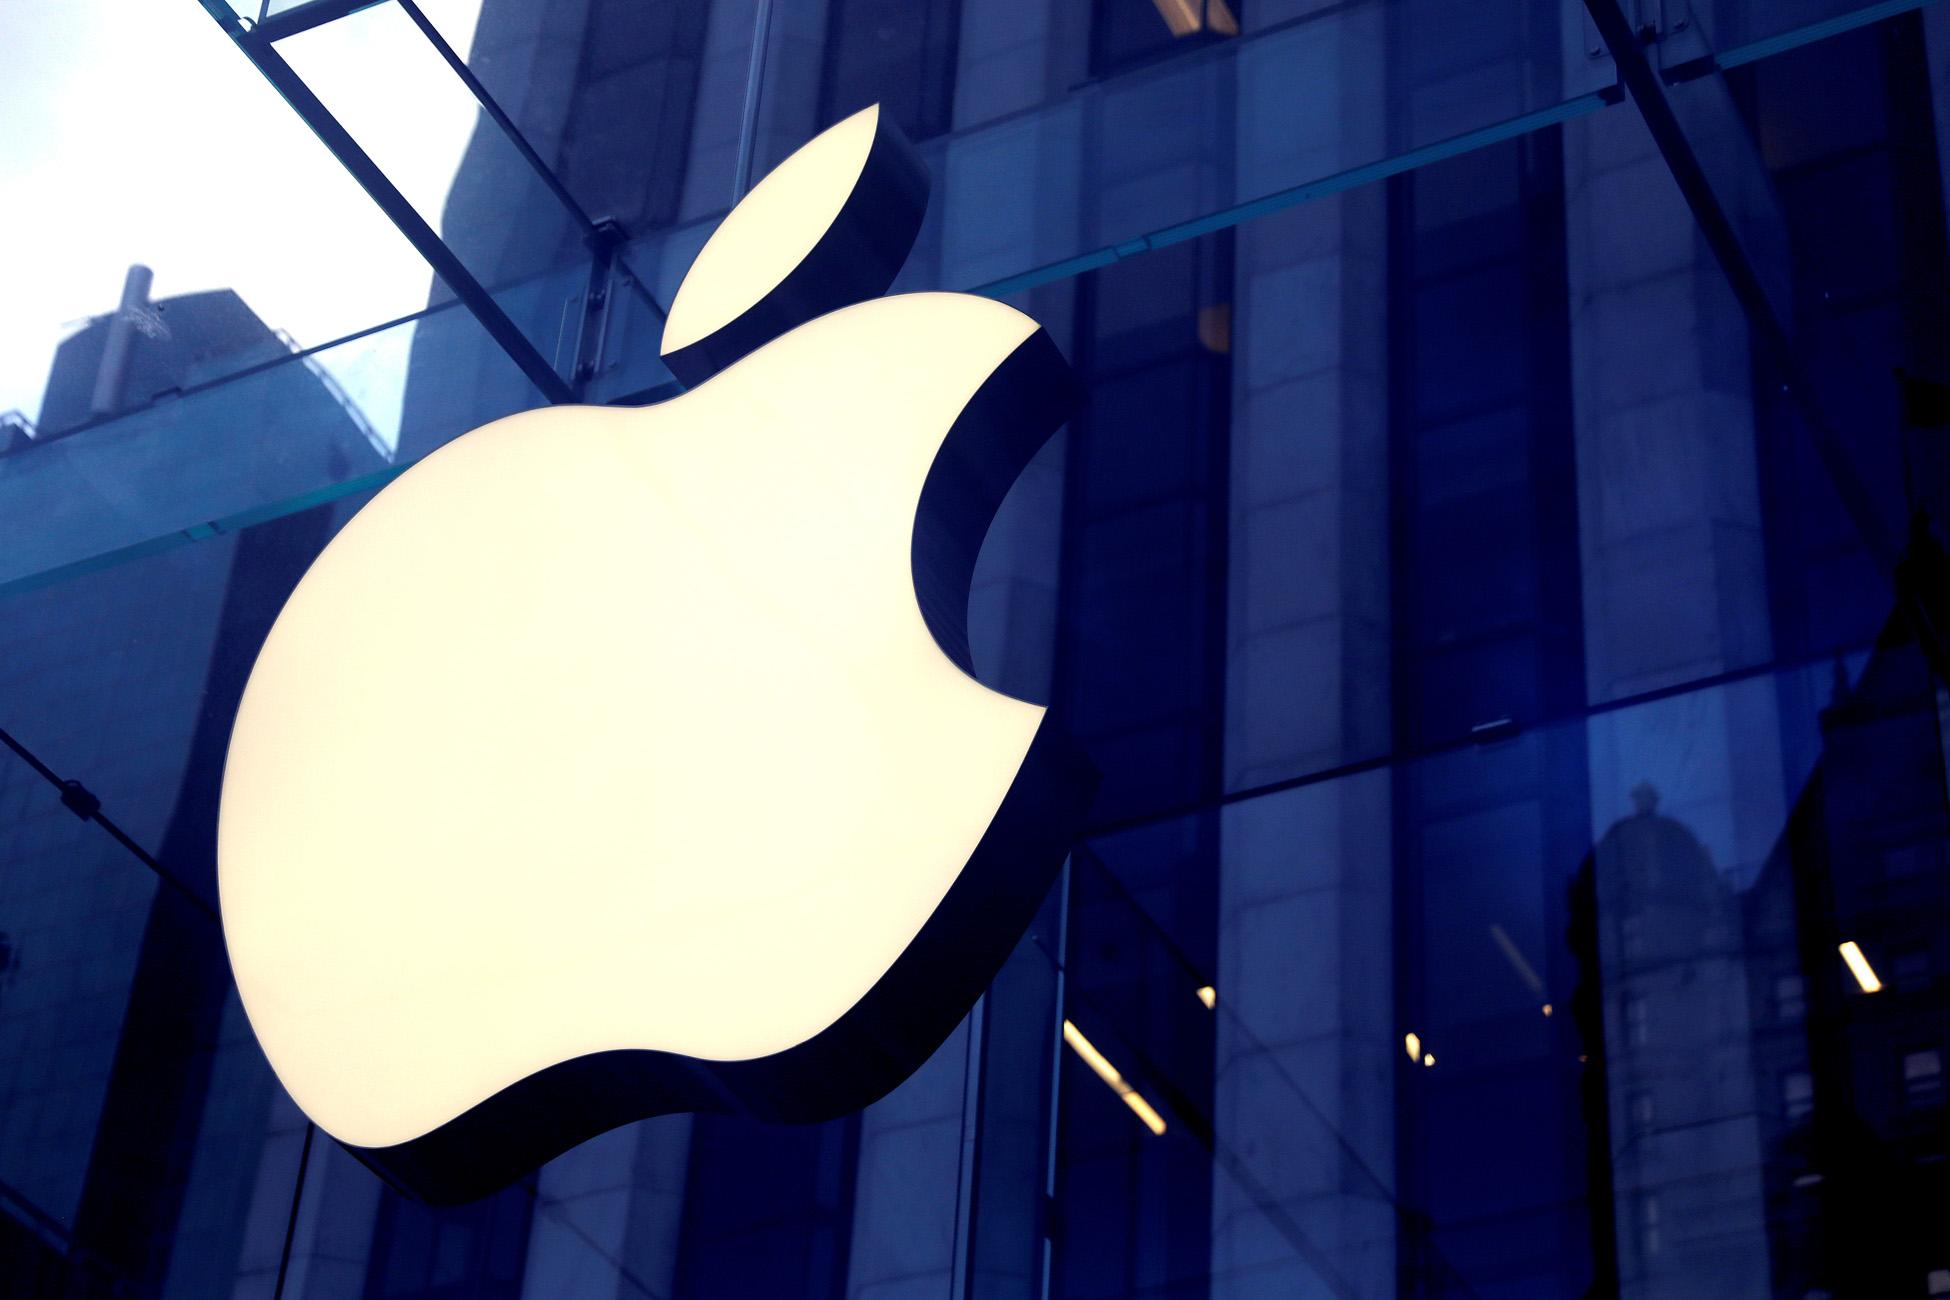 Apple: Τα σχέδια και τα εμπόδια για την κατασκευή ηλεκτρικού αυτοκινήτου